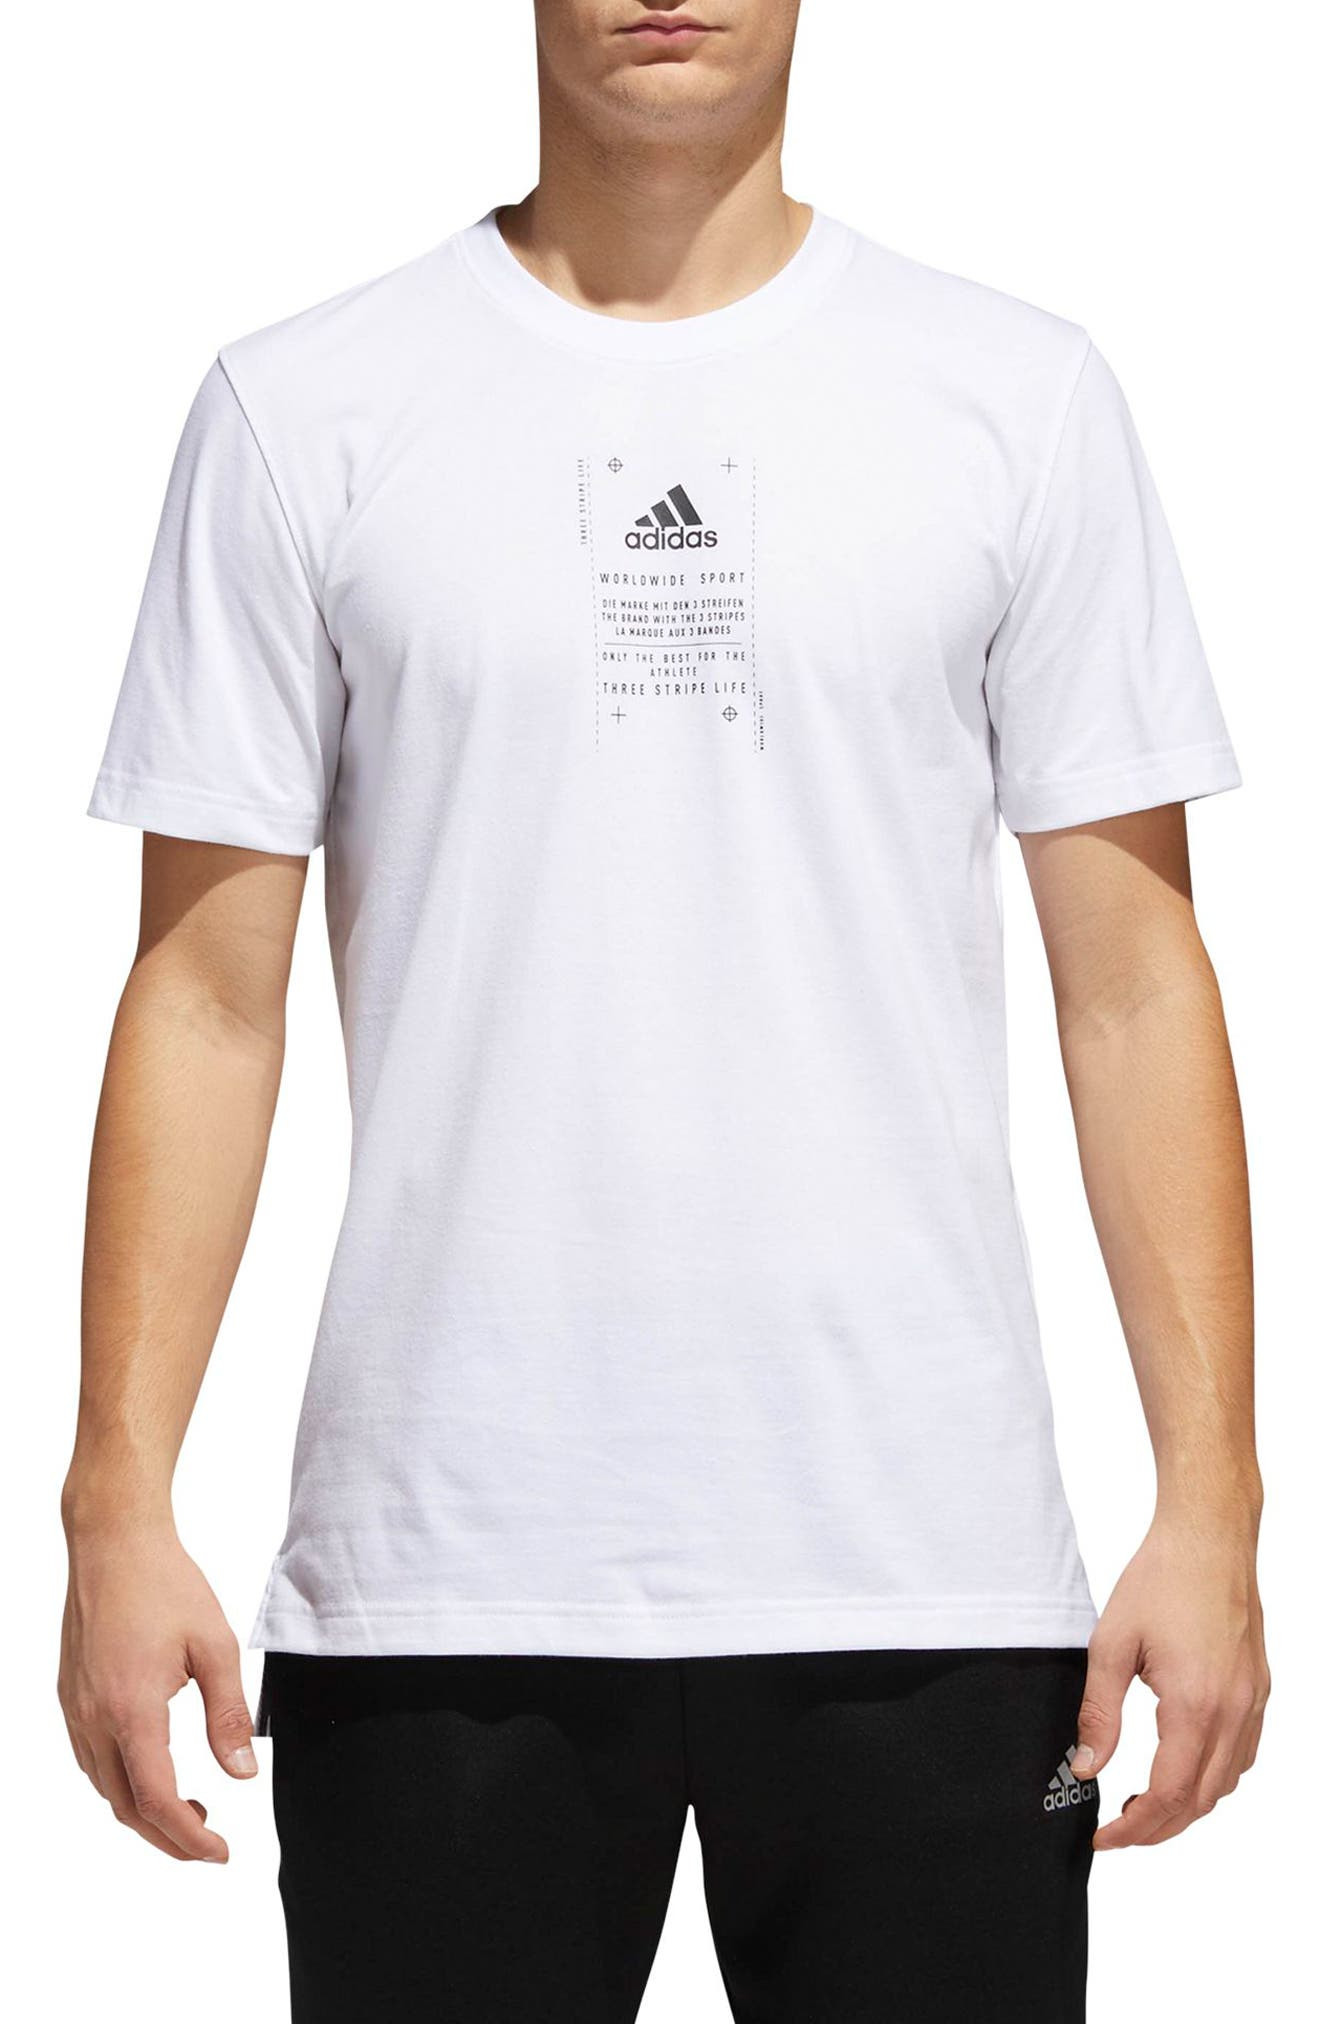 adidas BOS Label T-Shirt